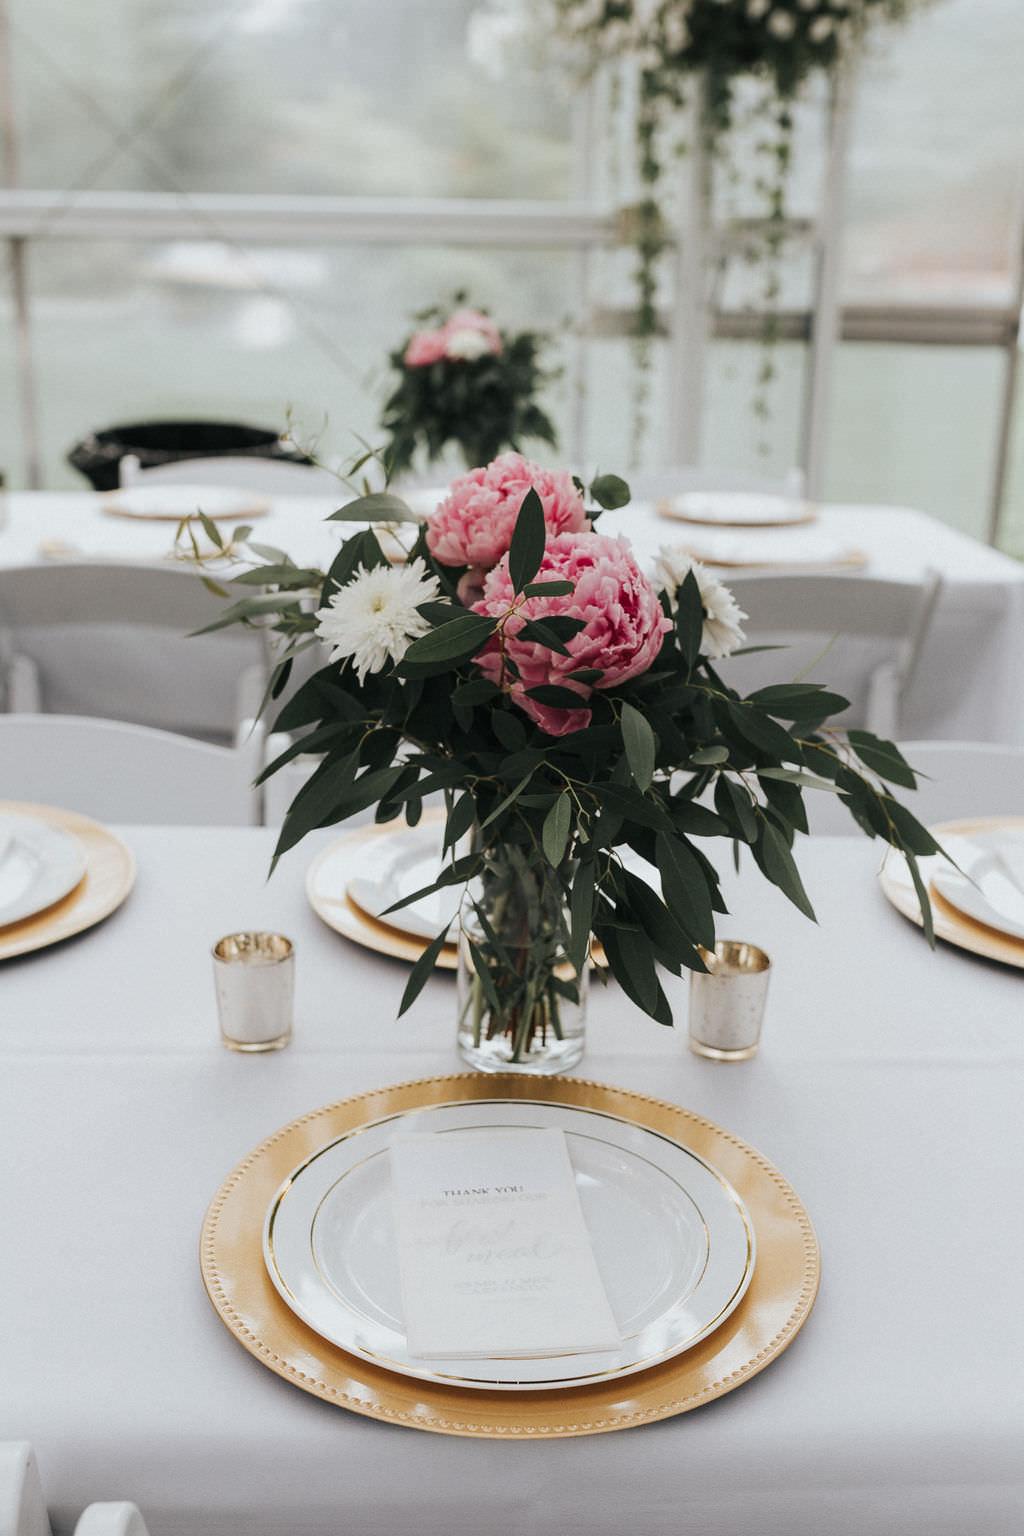 Table Flowers Vase Pink Peony Peonies Greenhouse Garden Washington Wedding Beginning and End Photography